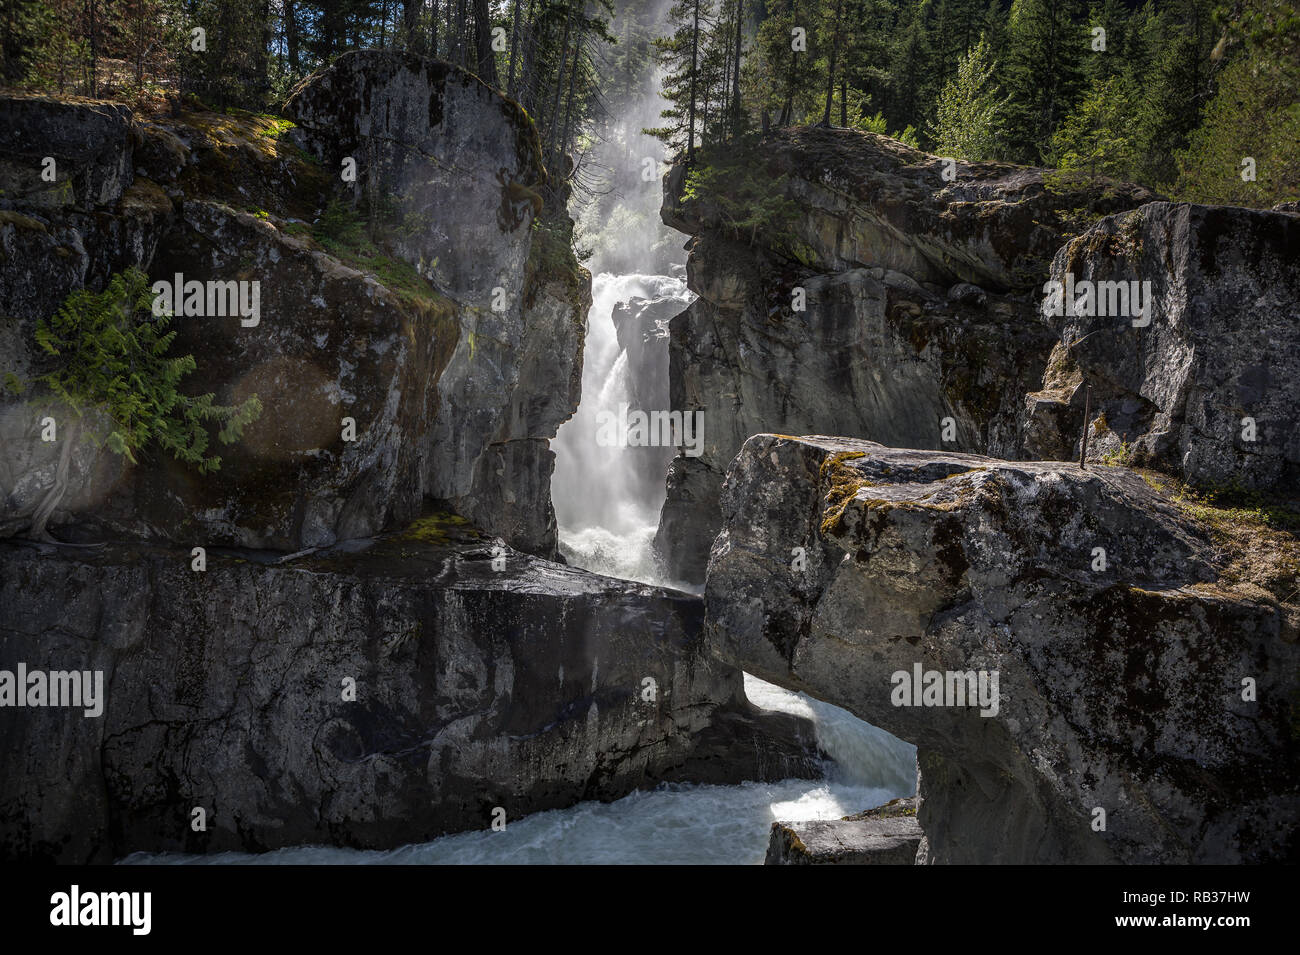 Nairn Falls, British Columbia, Canada - Stock Image